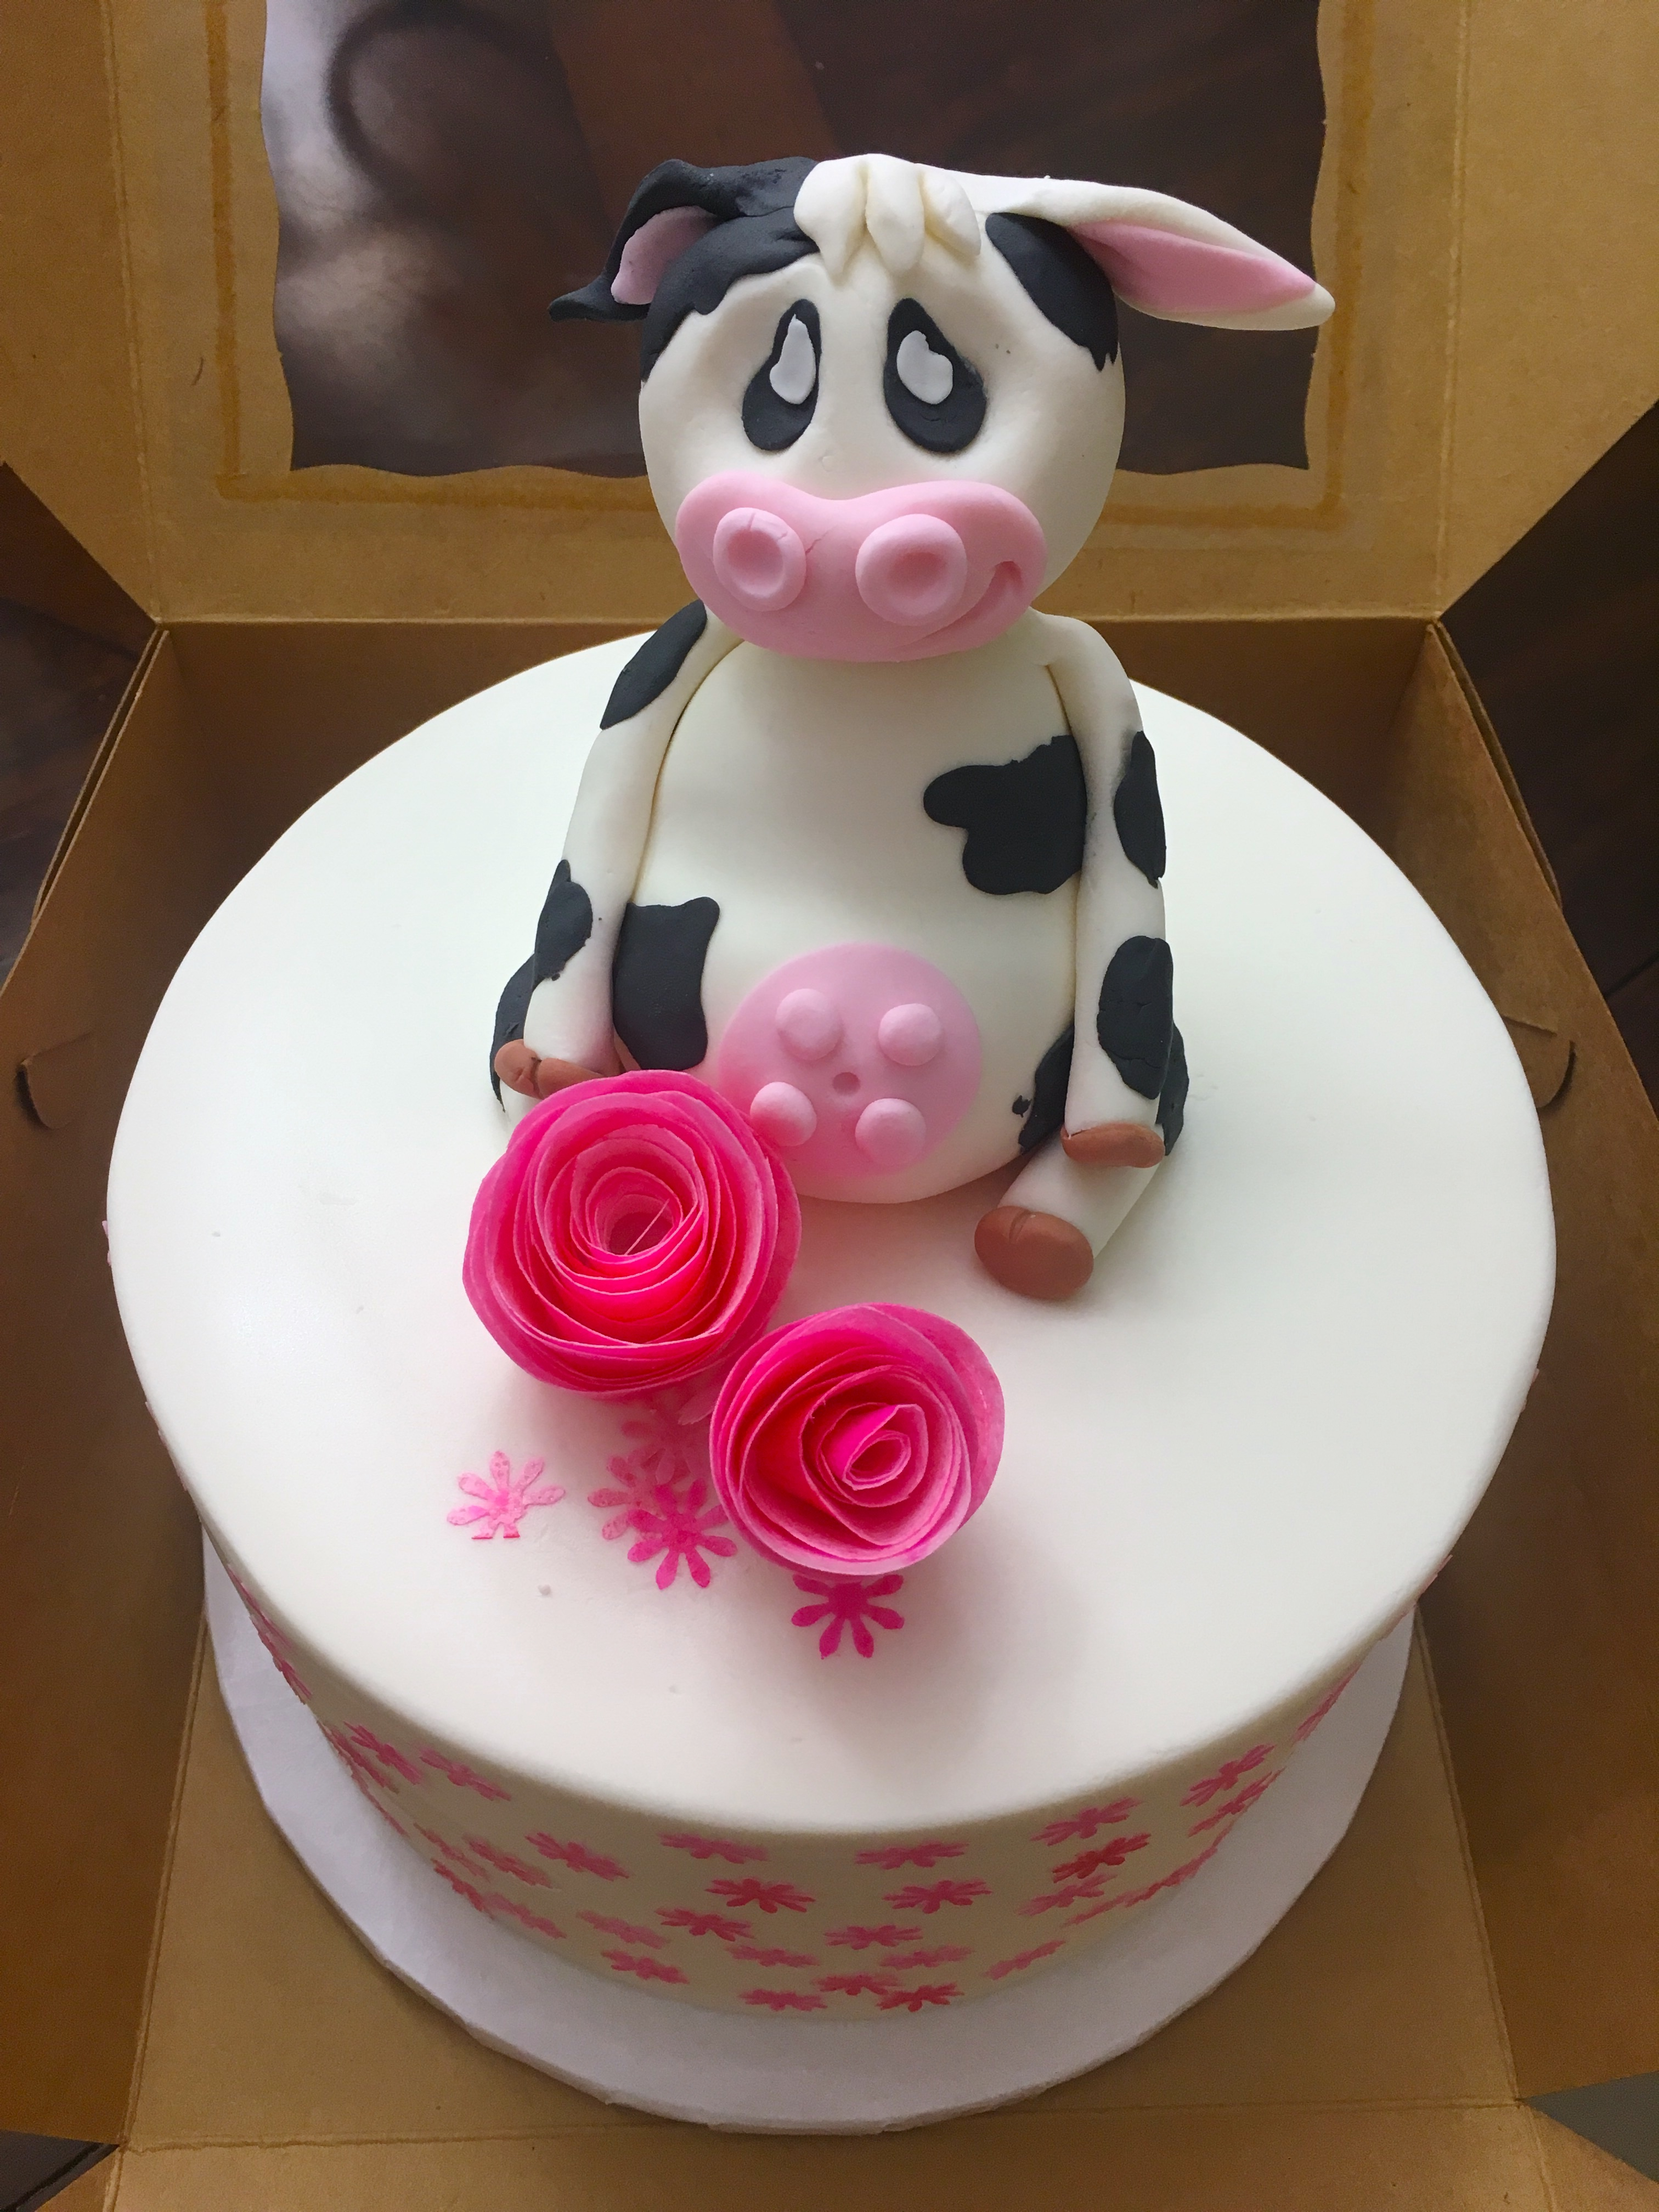 Precious Moments Themed Cake